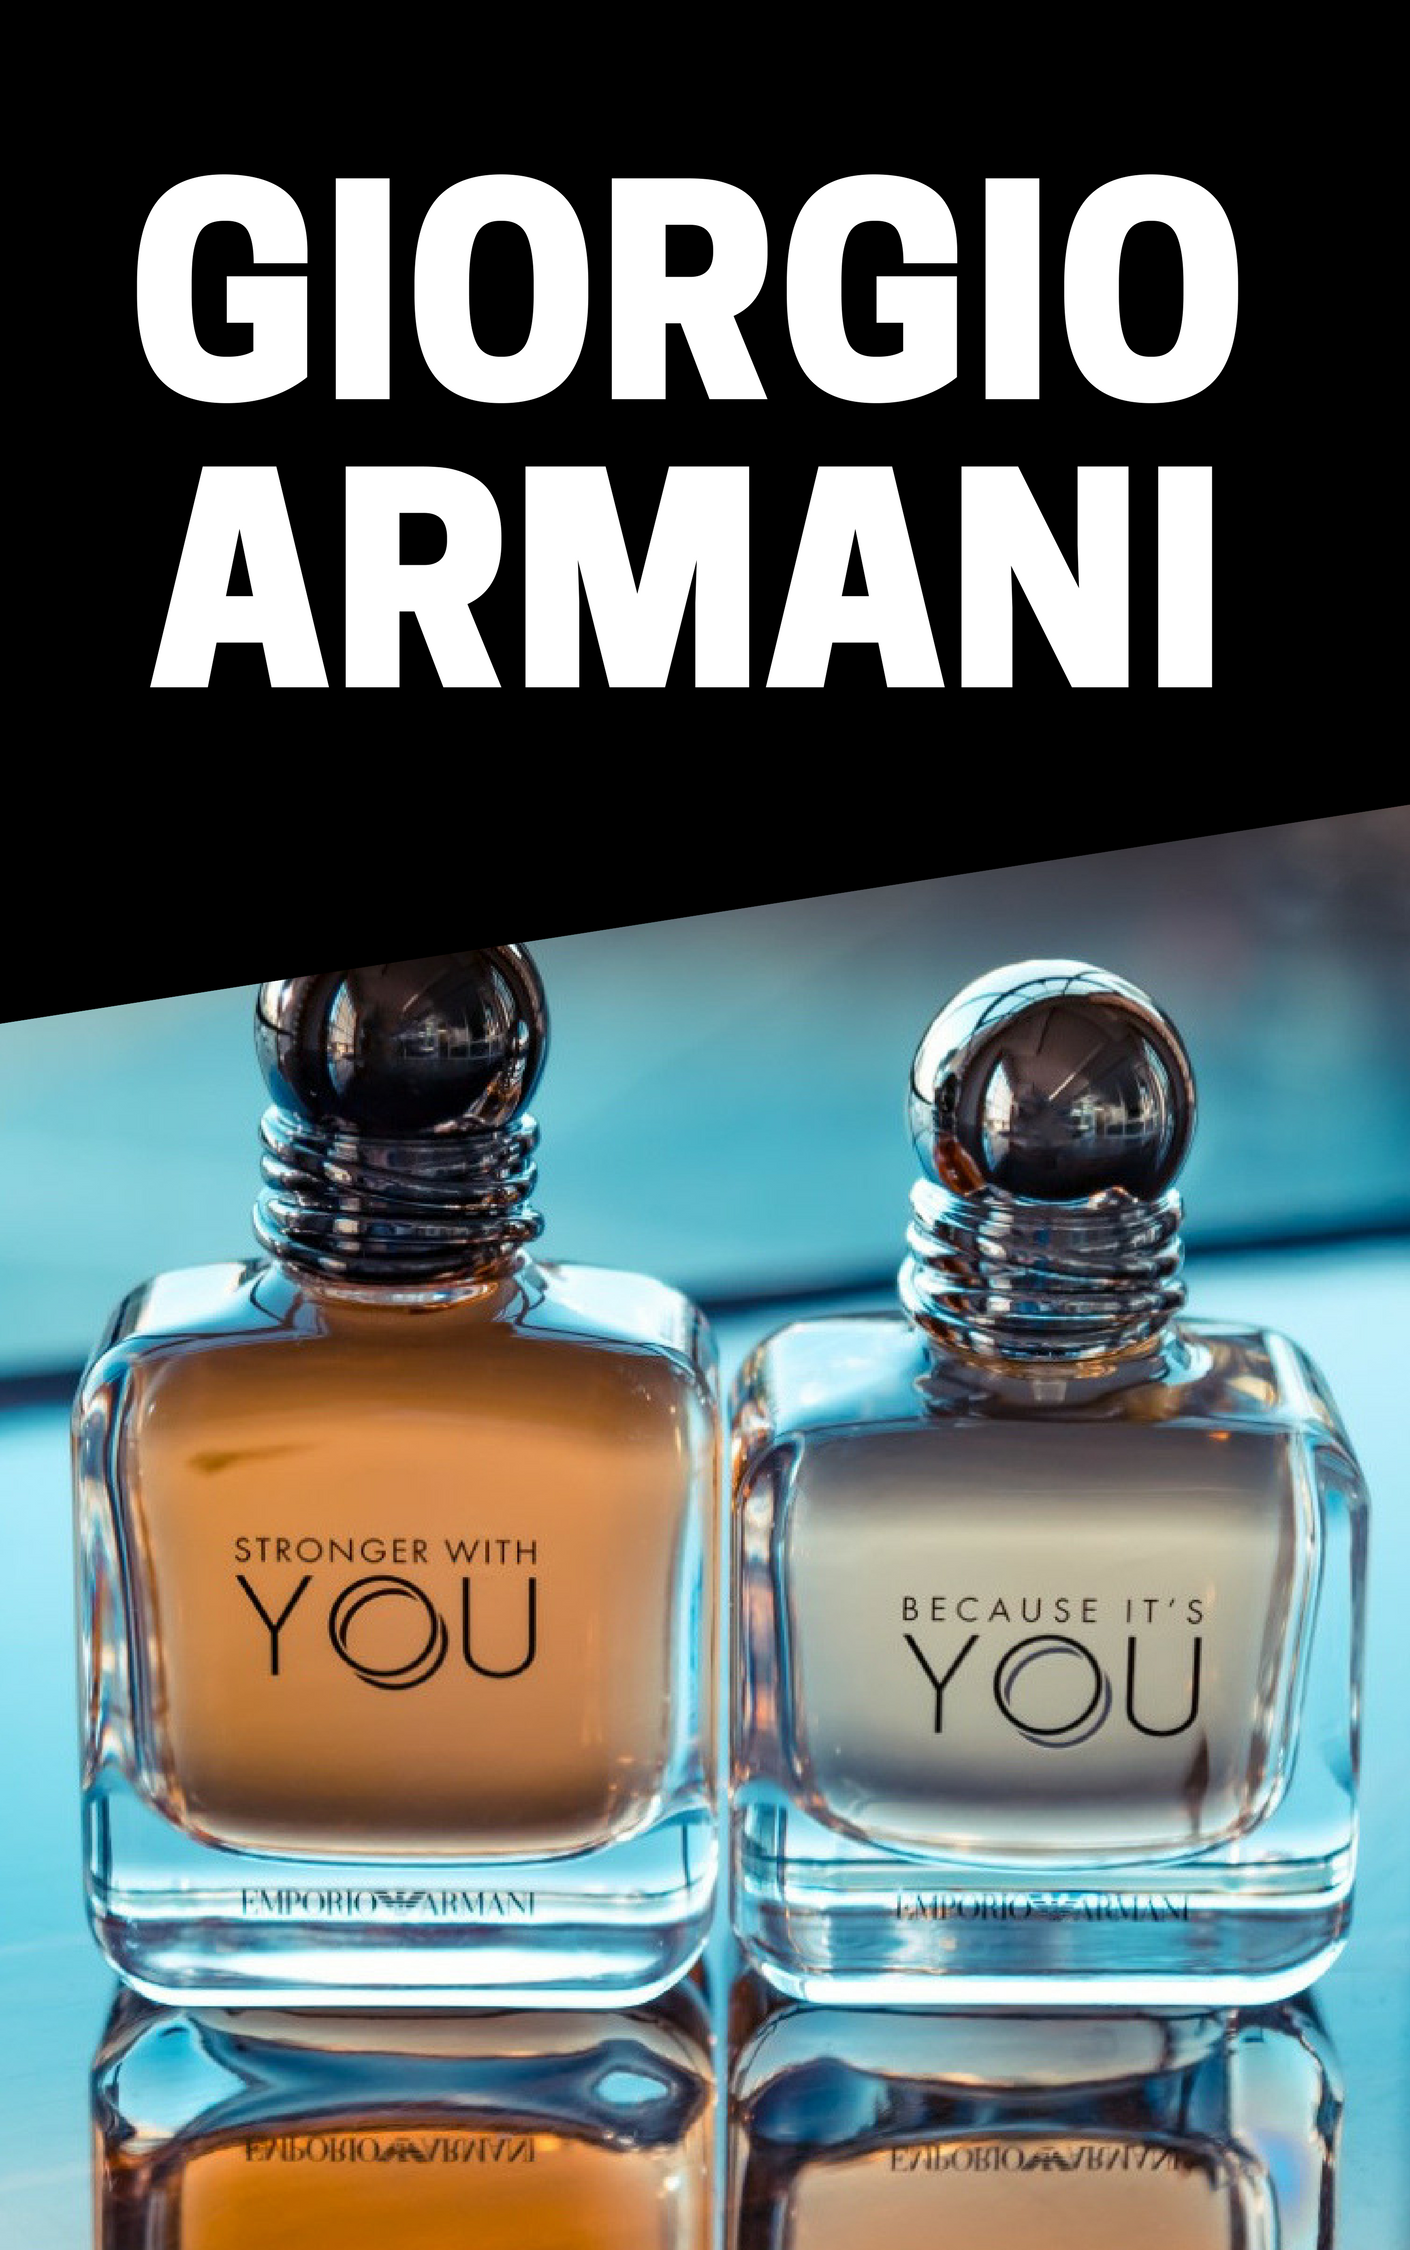 Perfume Emporium Giorgio Armani Perfumes And Colognes Milled